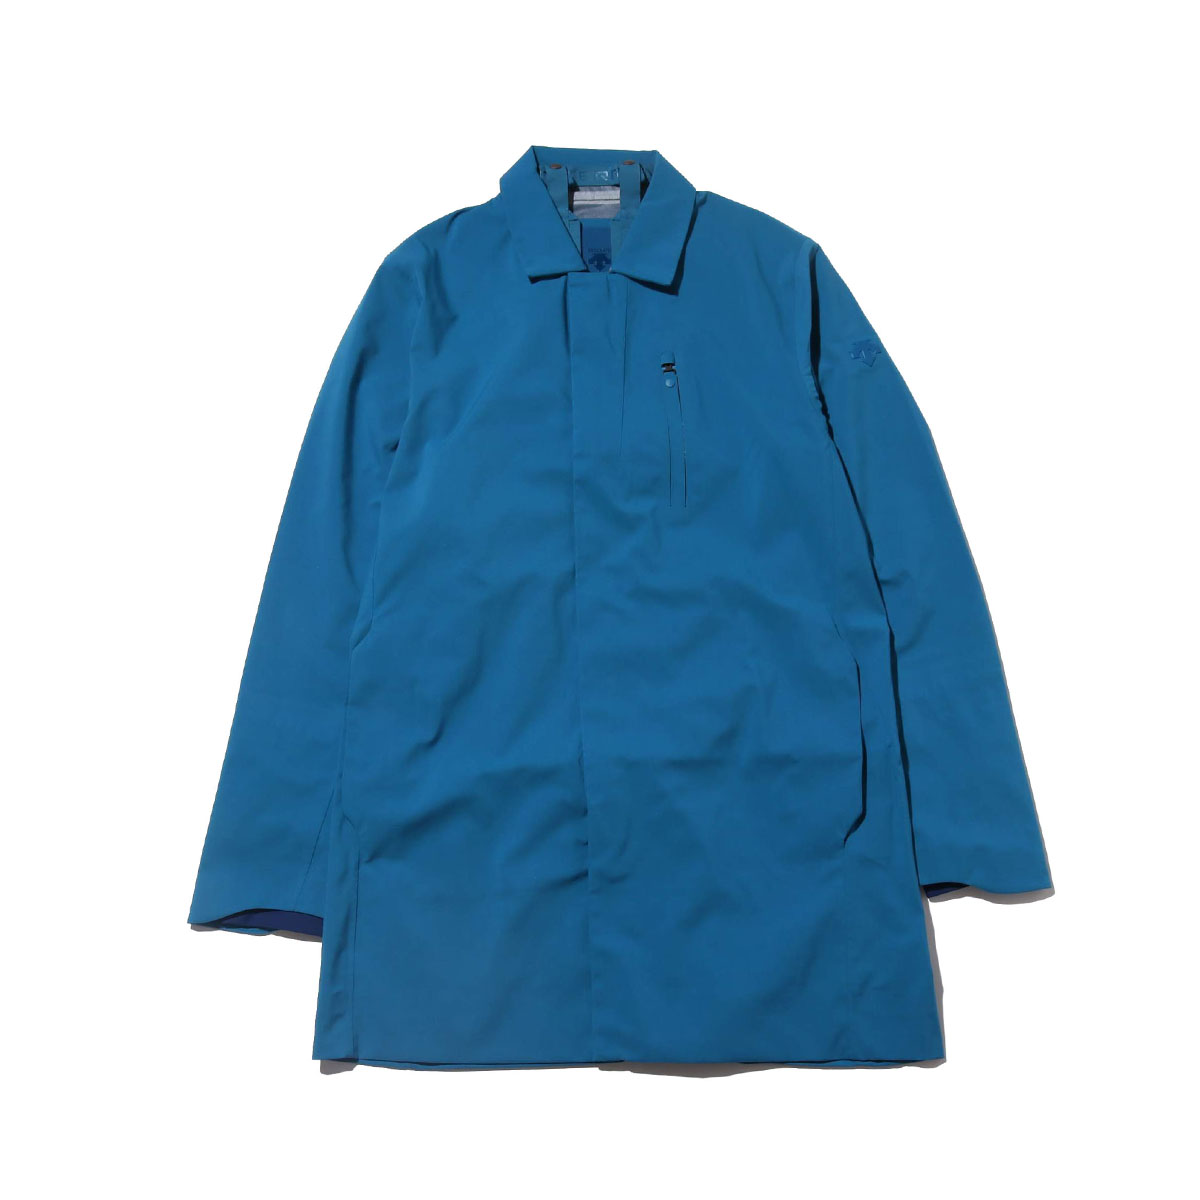 DESCENTE ALLTERRAIN HARD SHELL BAL COLLAR COAT(BLUE ACID)(デサント オルテライン ハード シェル ステンカラー コート)【メンズ】【コート】【18FA-I】